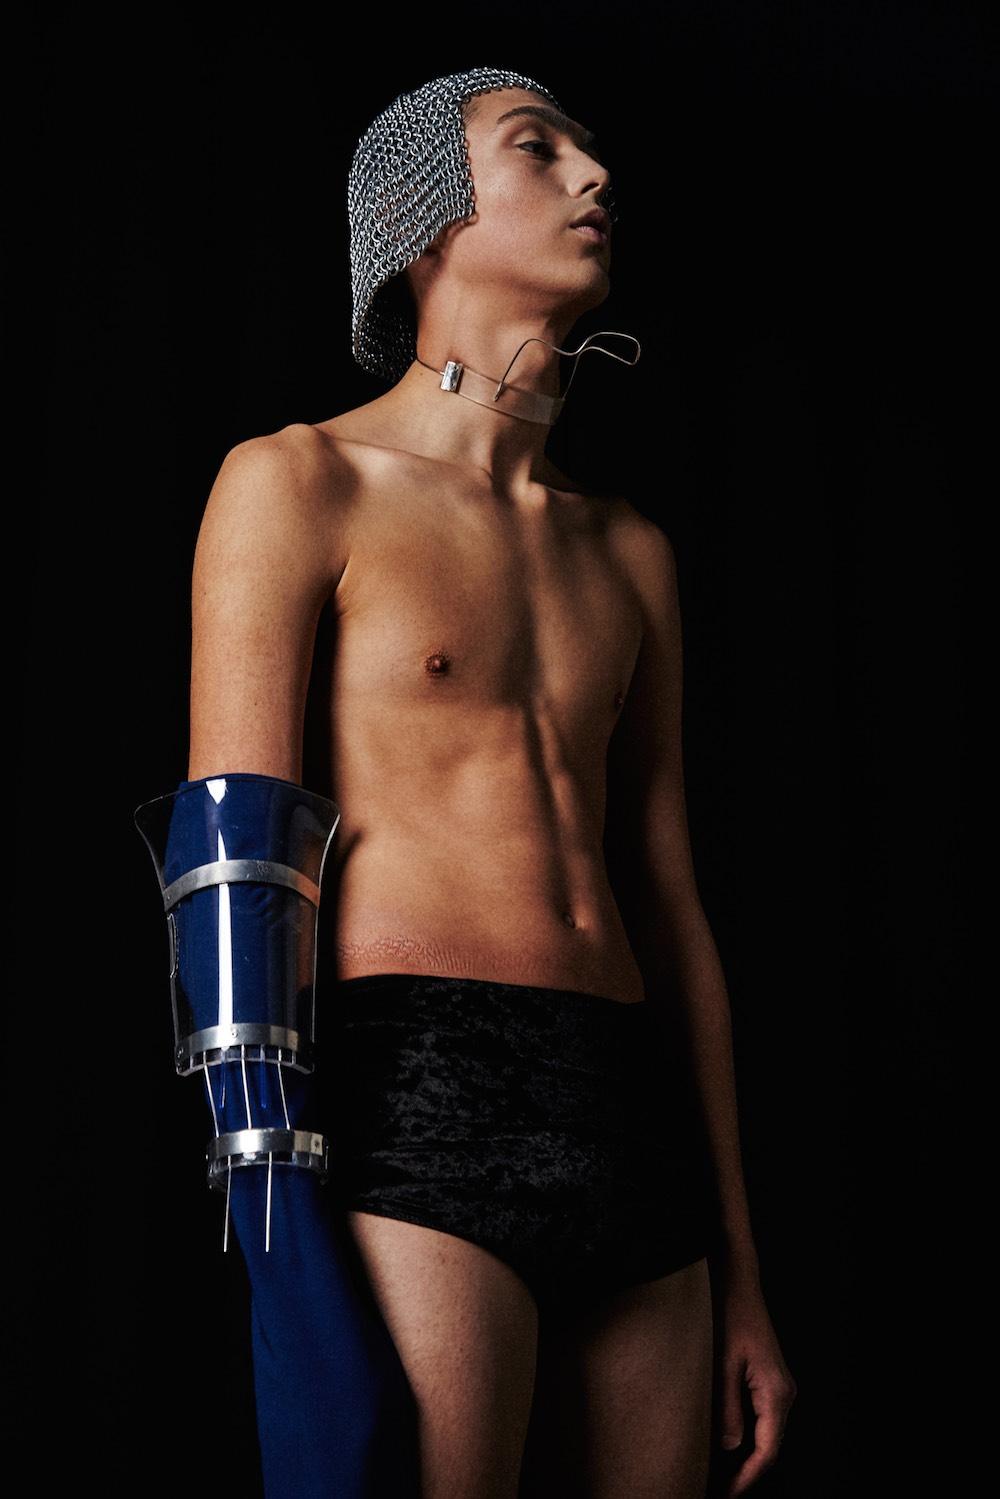 MA Fashion Photography graduate Sampson Wu.